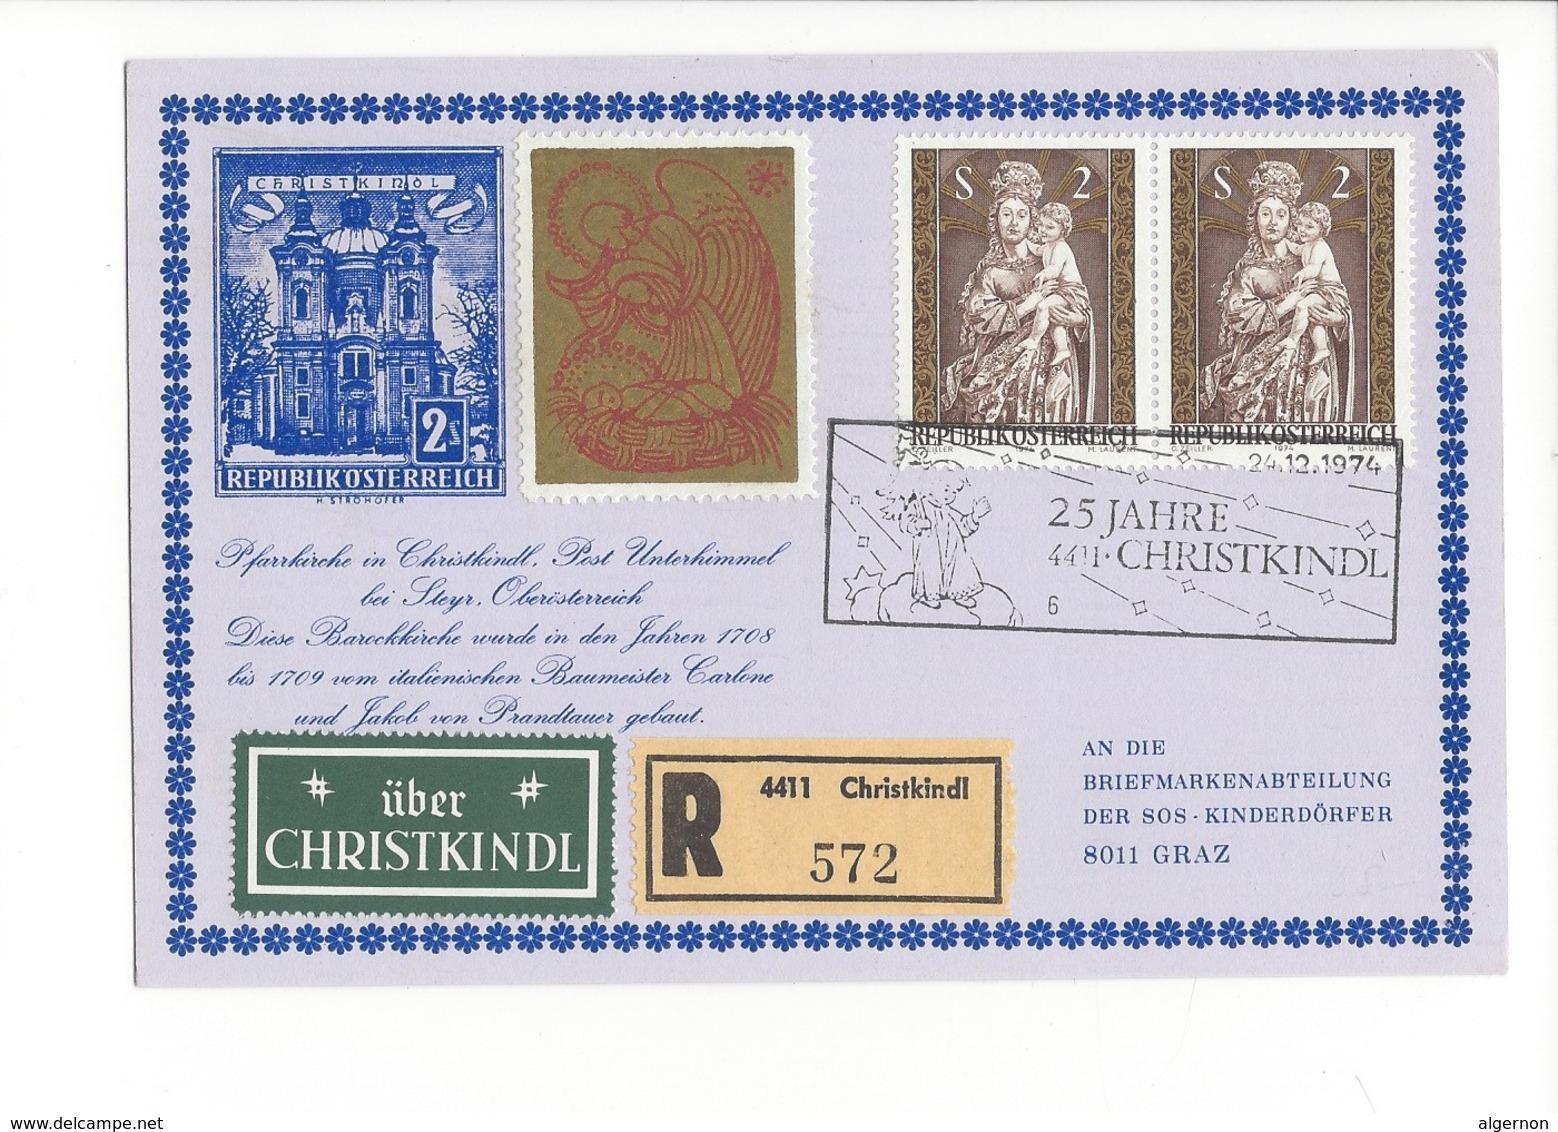 20984 -  Christkindl 24.12.1974 Carte Recommandée Pour Graz+ Vignette über Christkindl 25 Jahre - Noël